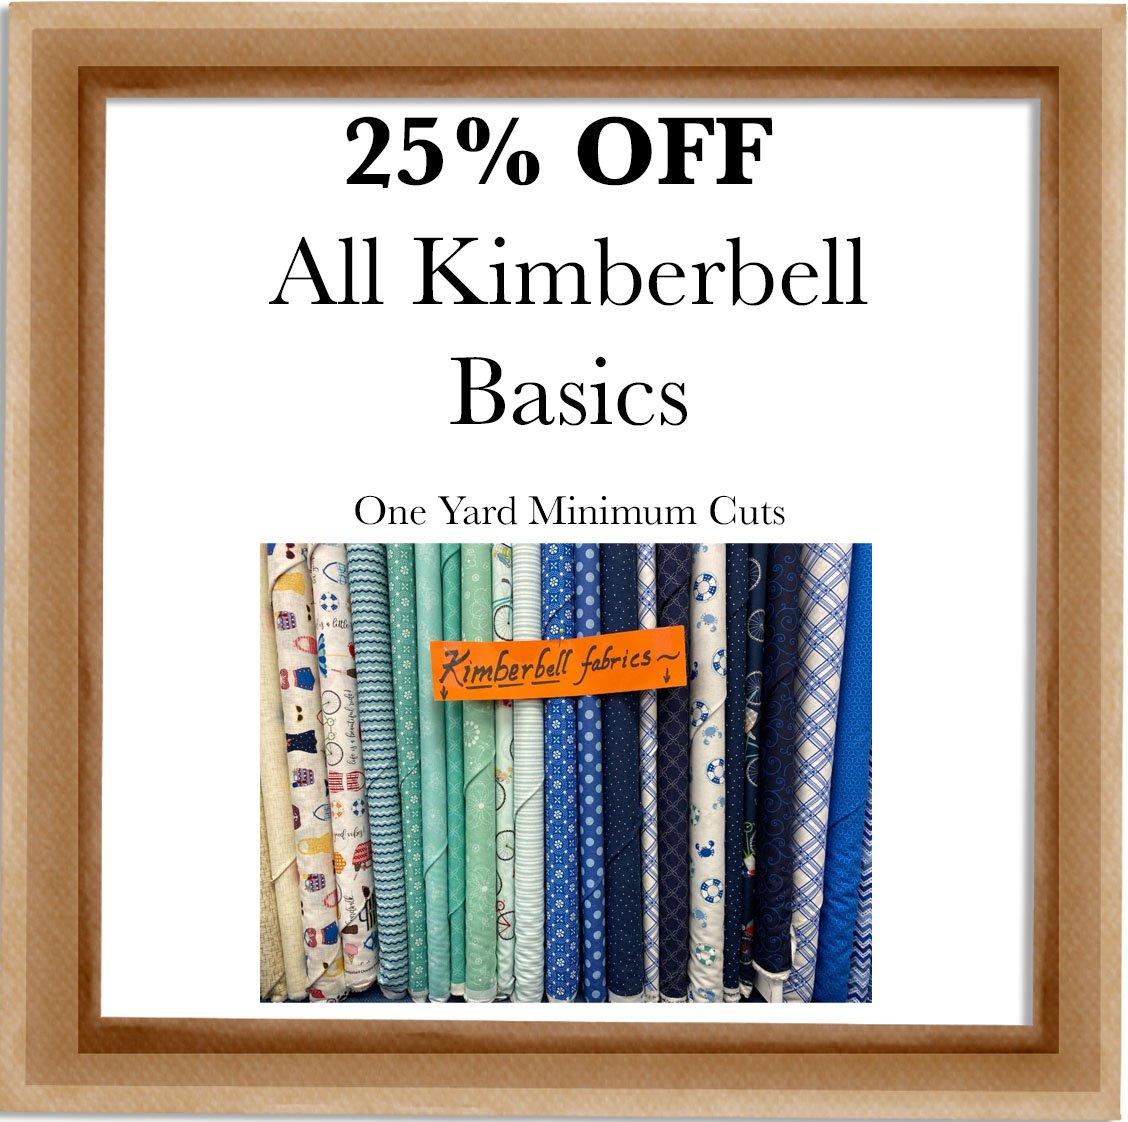 Kimberbell Basics Sale